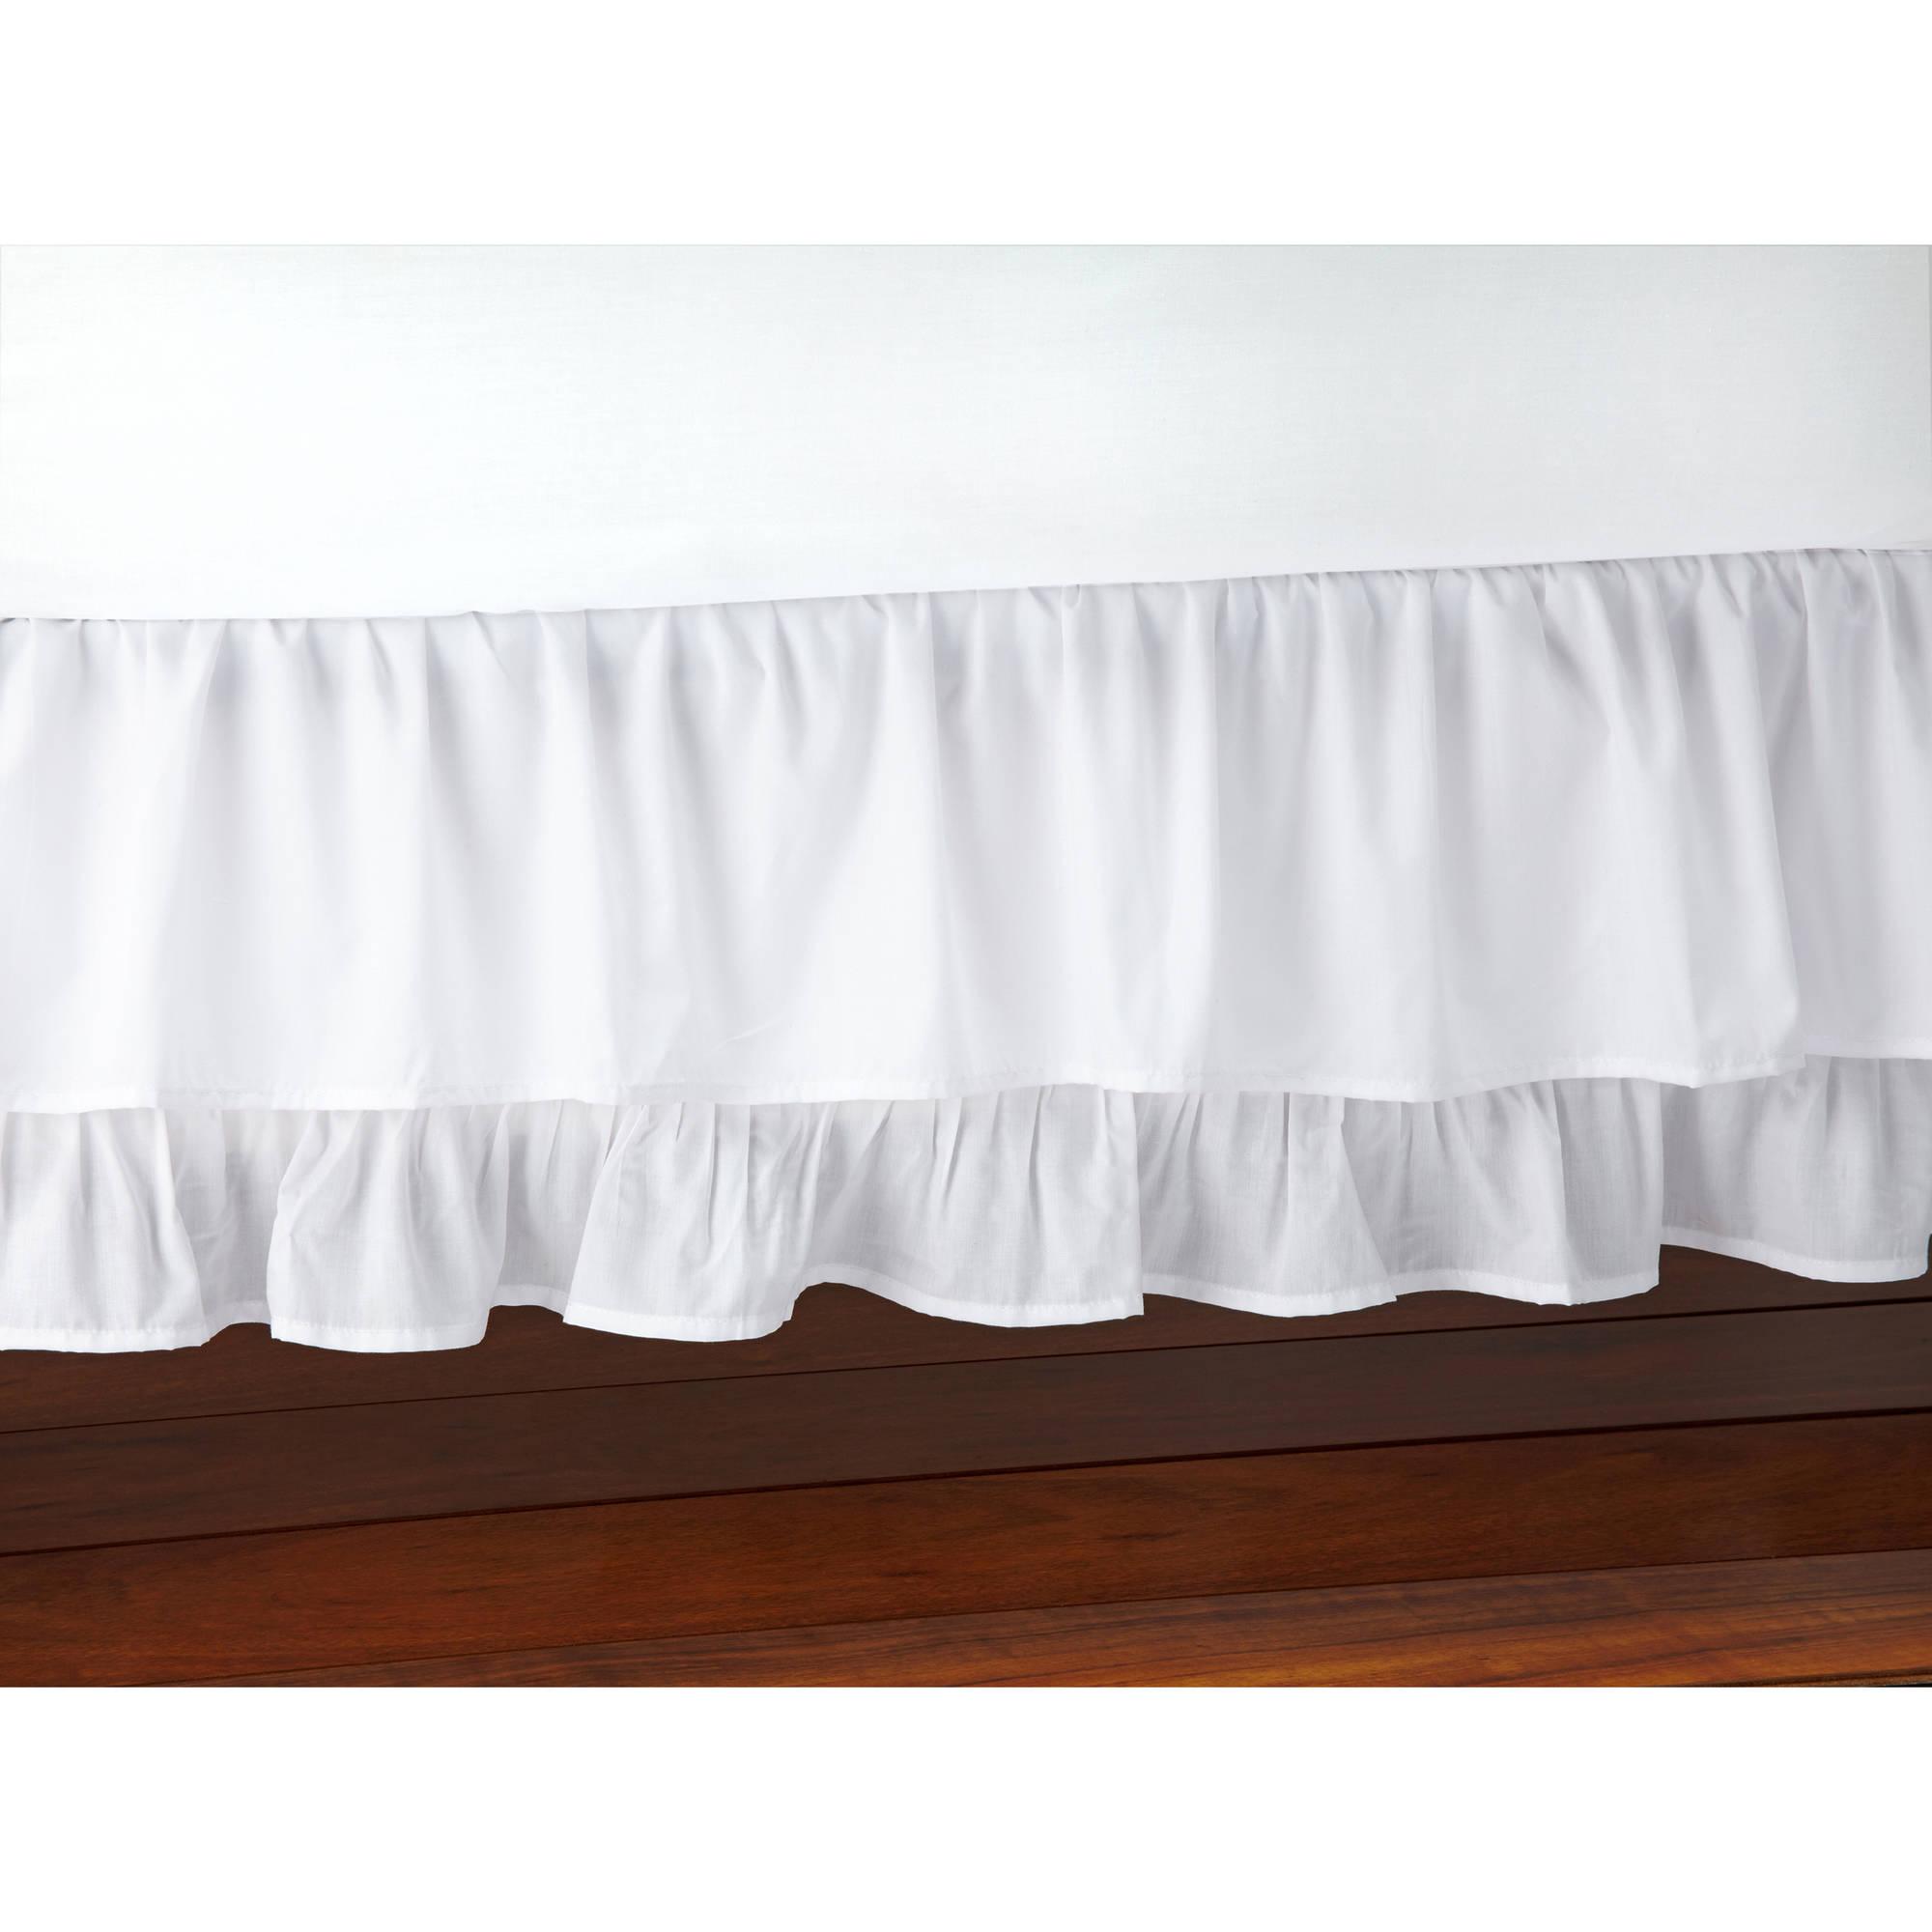 Little Love 2-Tier Ruffled White Crib Skirt/Dust Ruffle